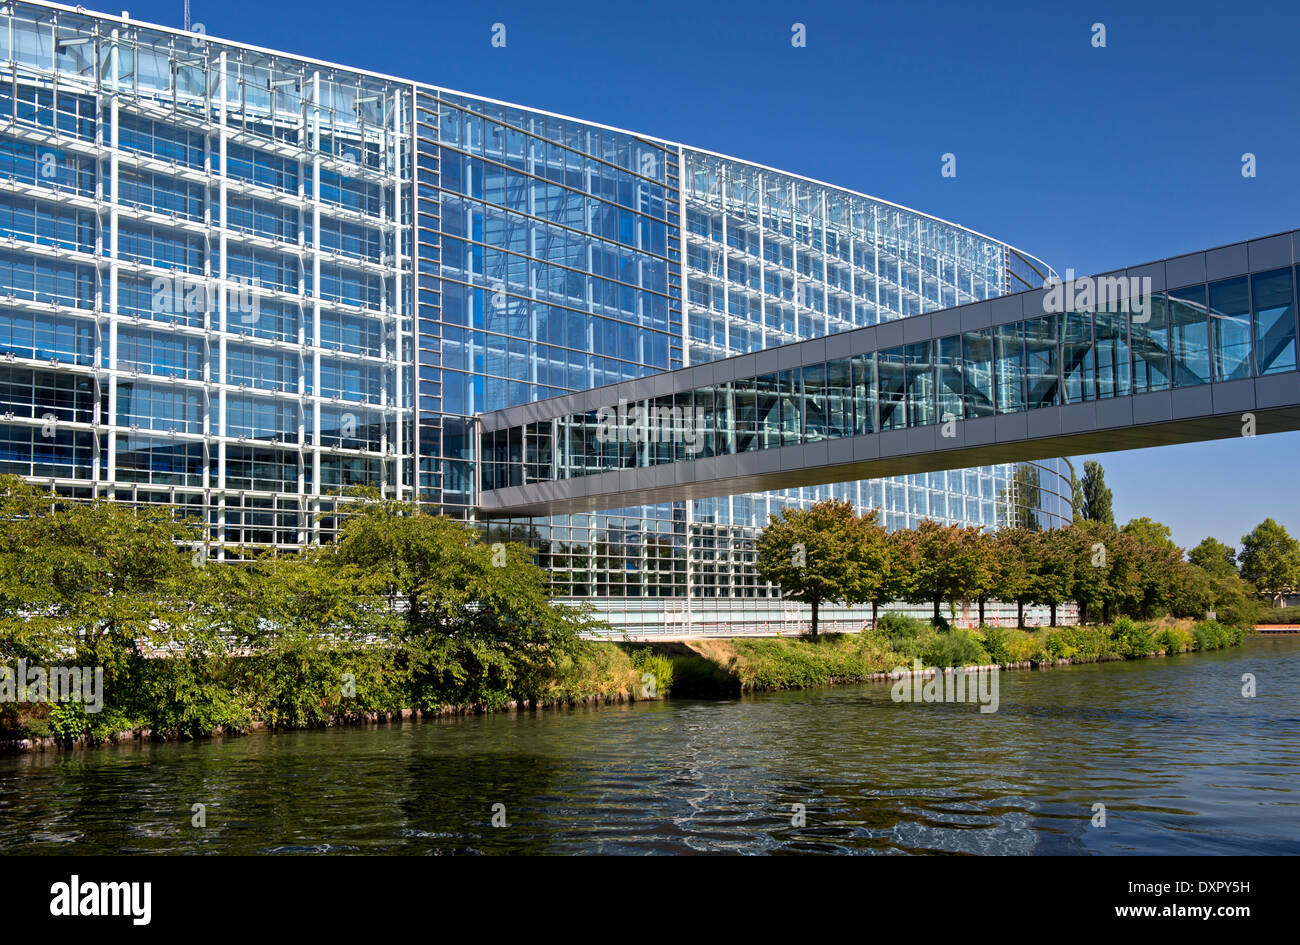 European Parliament building, Strasbourg, Alsace, France - Stock Image